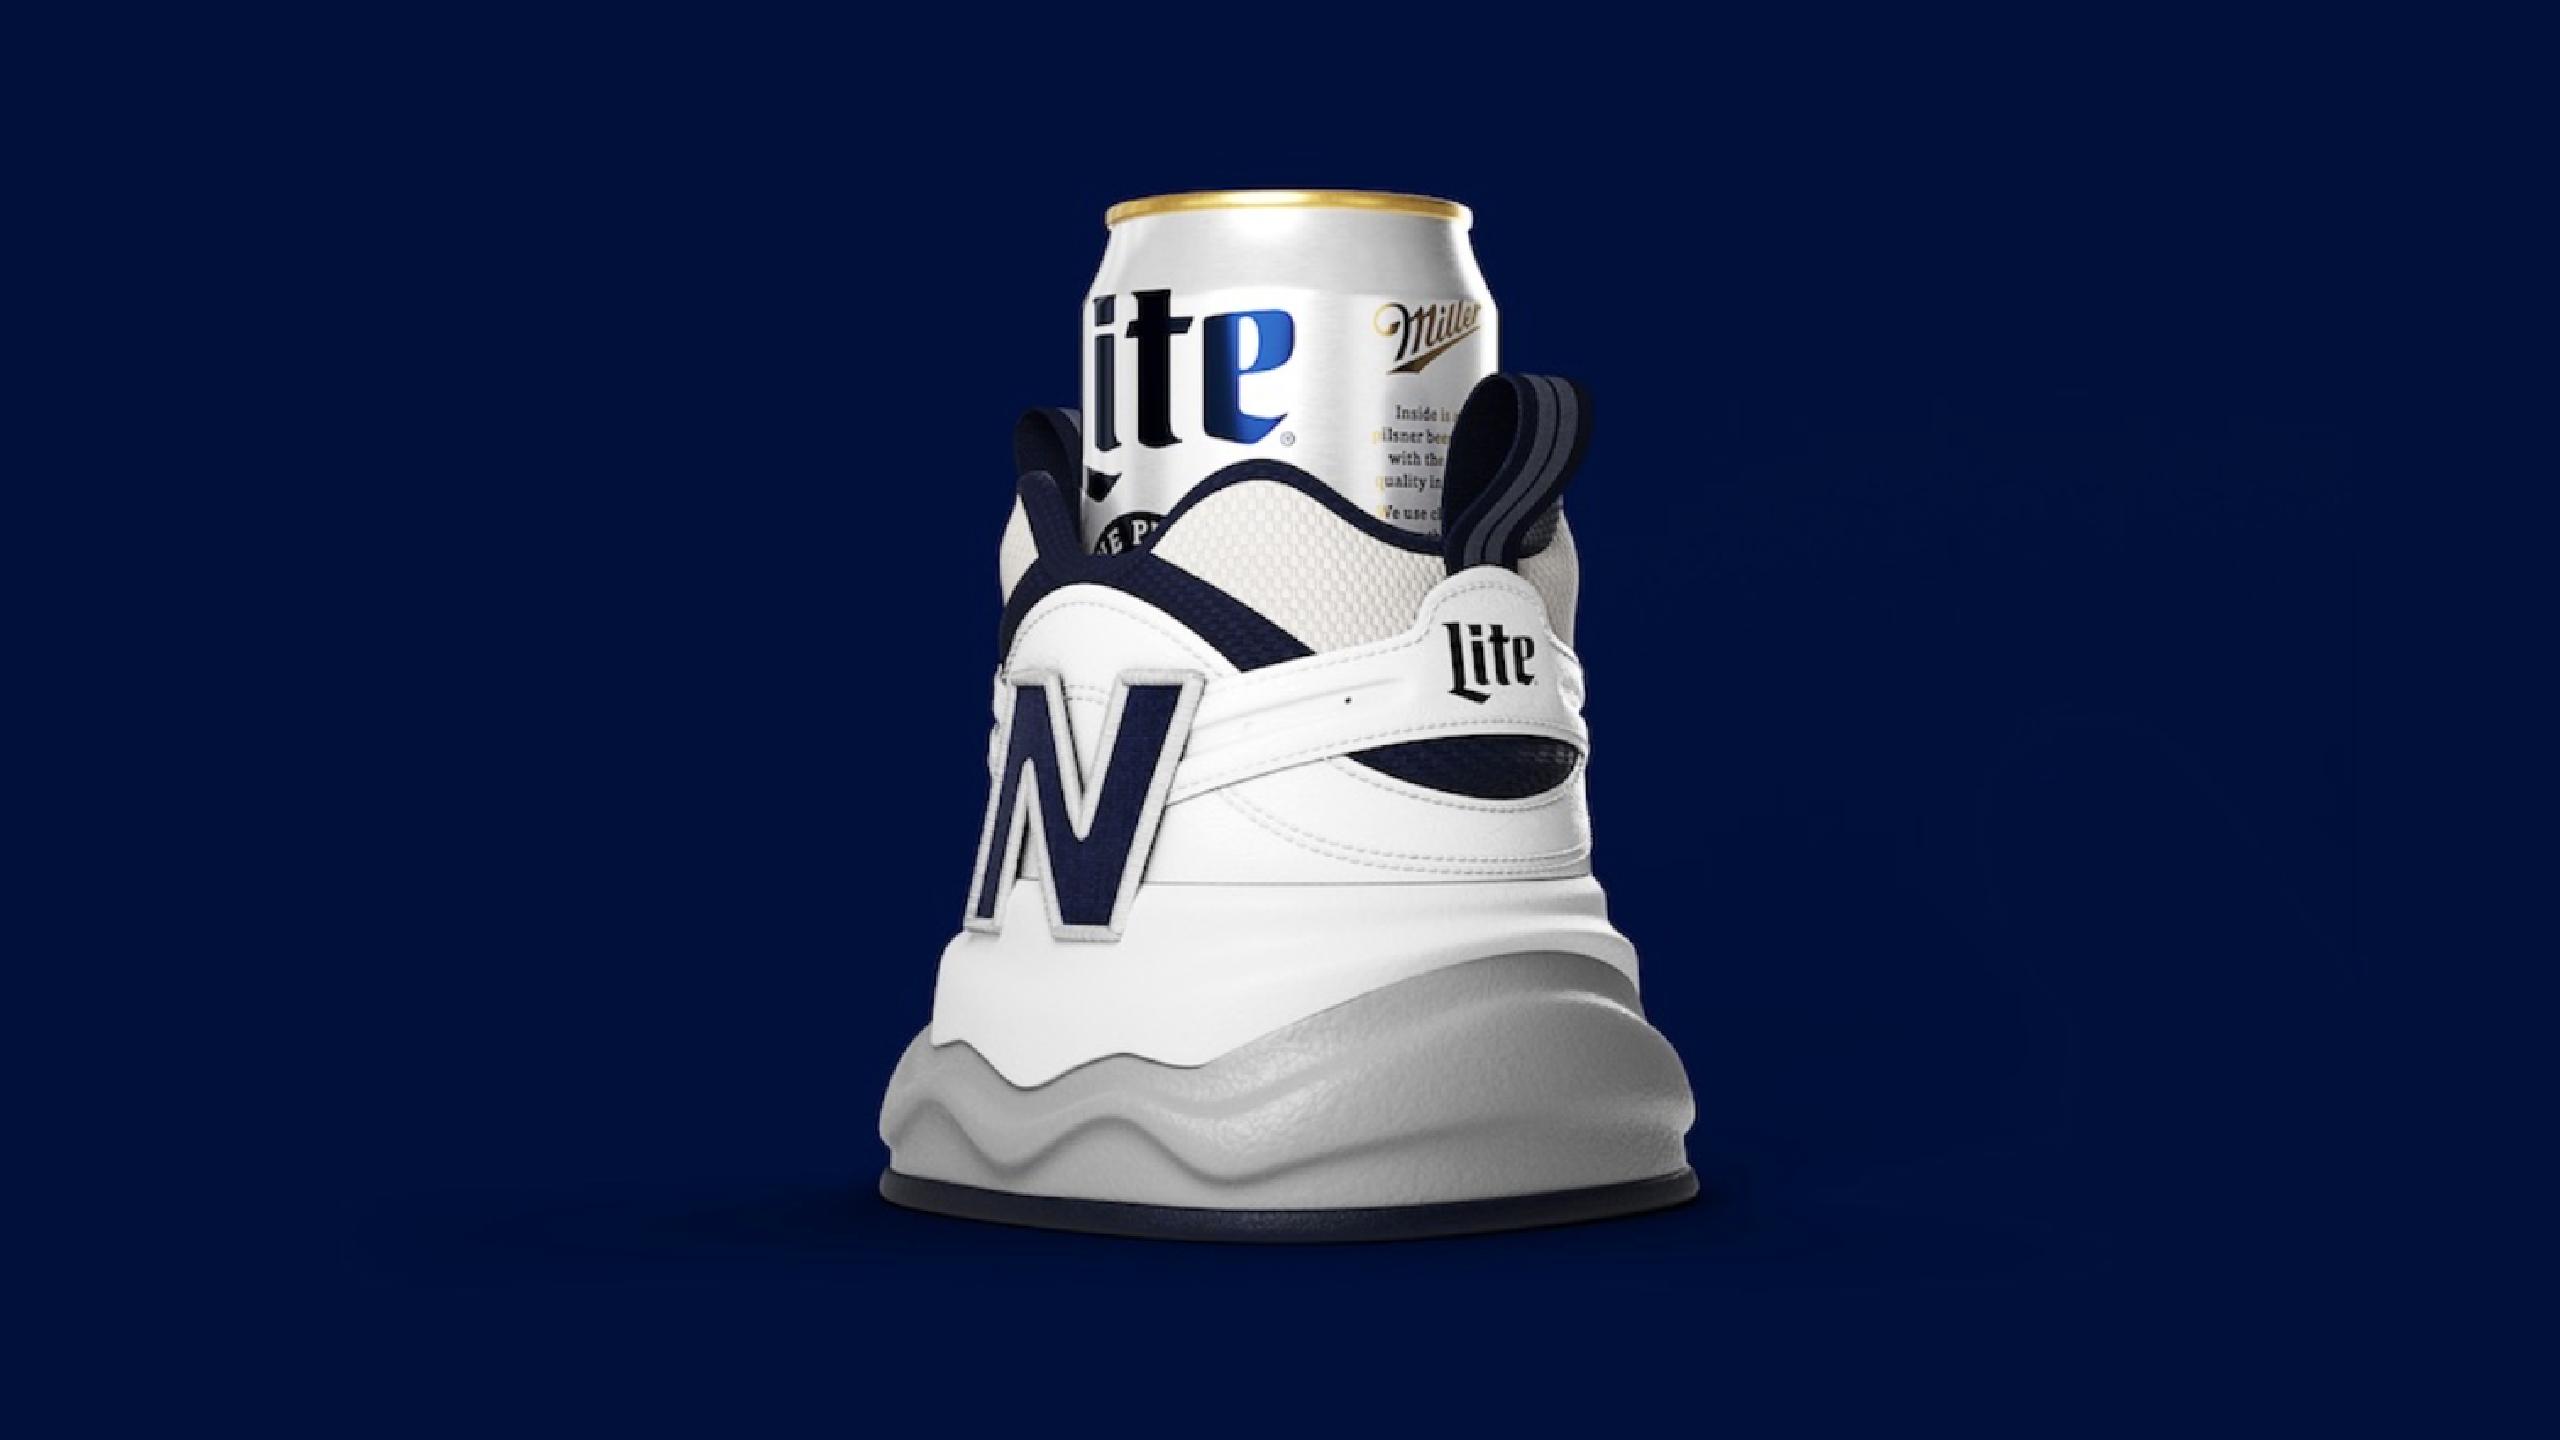 Shoezie New Balance Beer Koozie